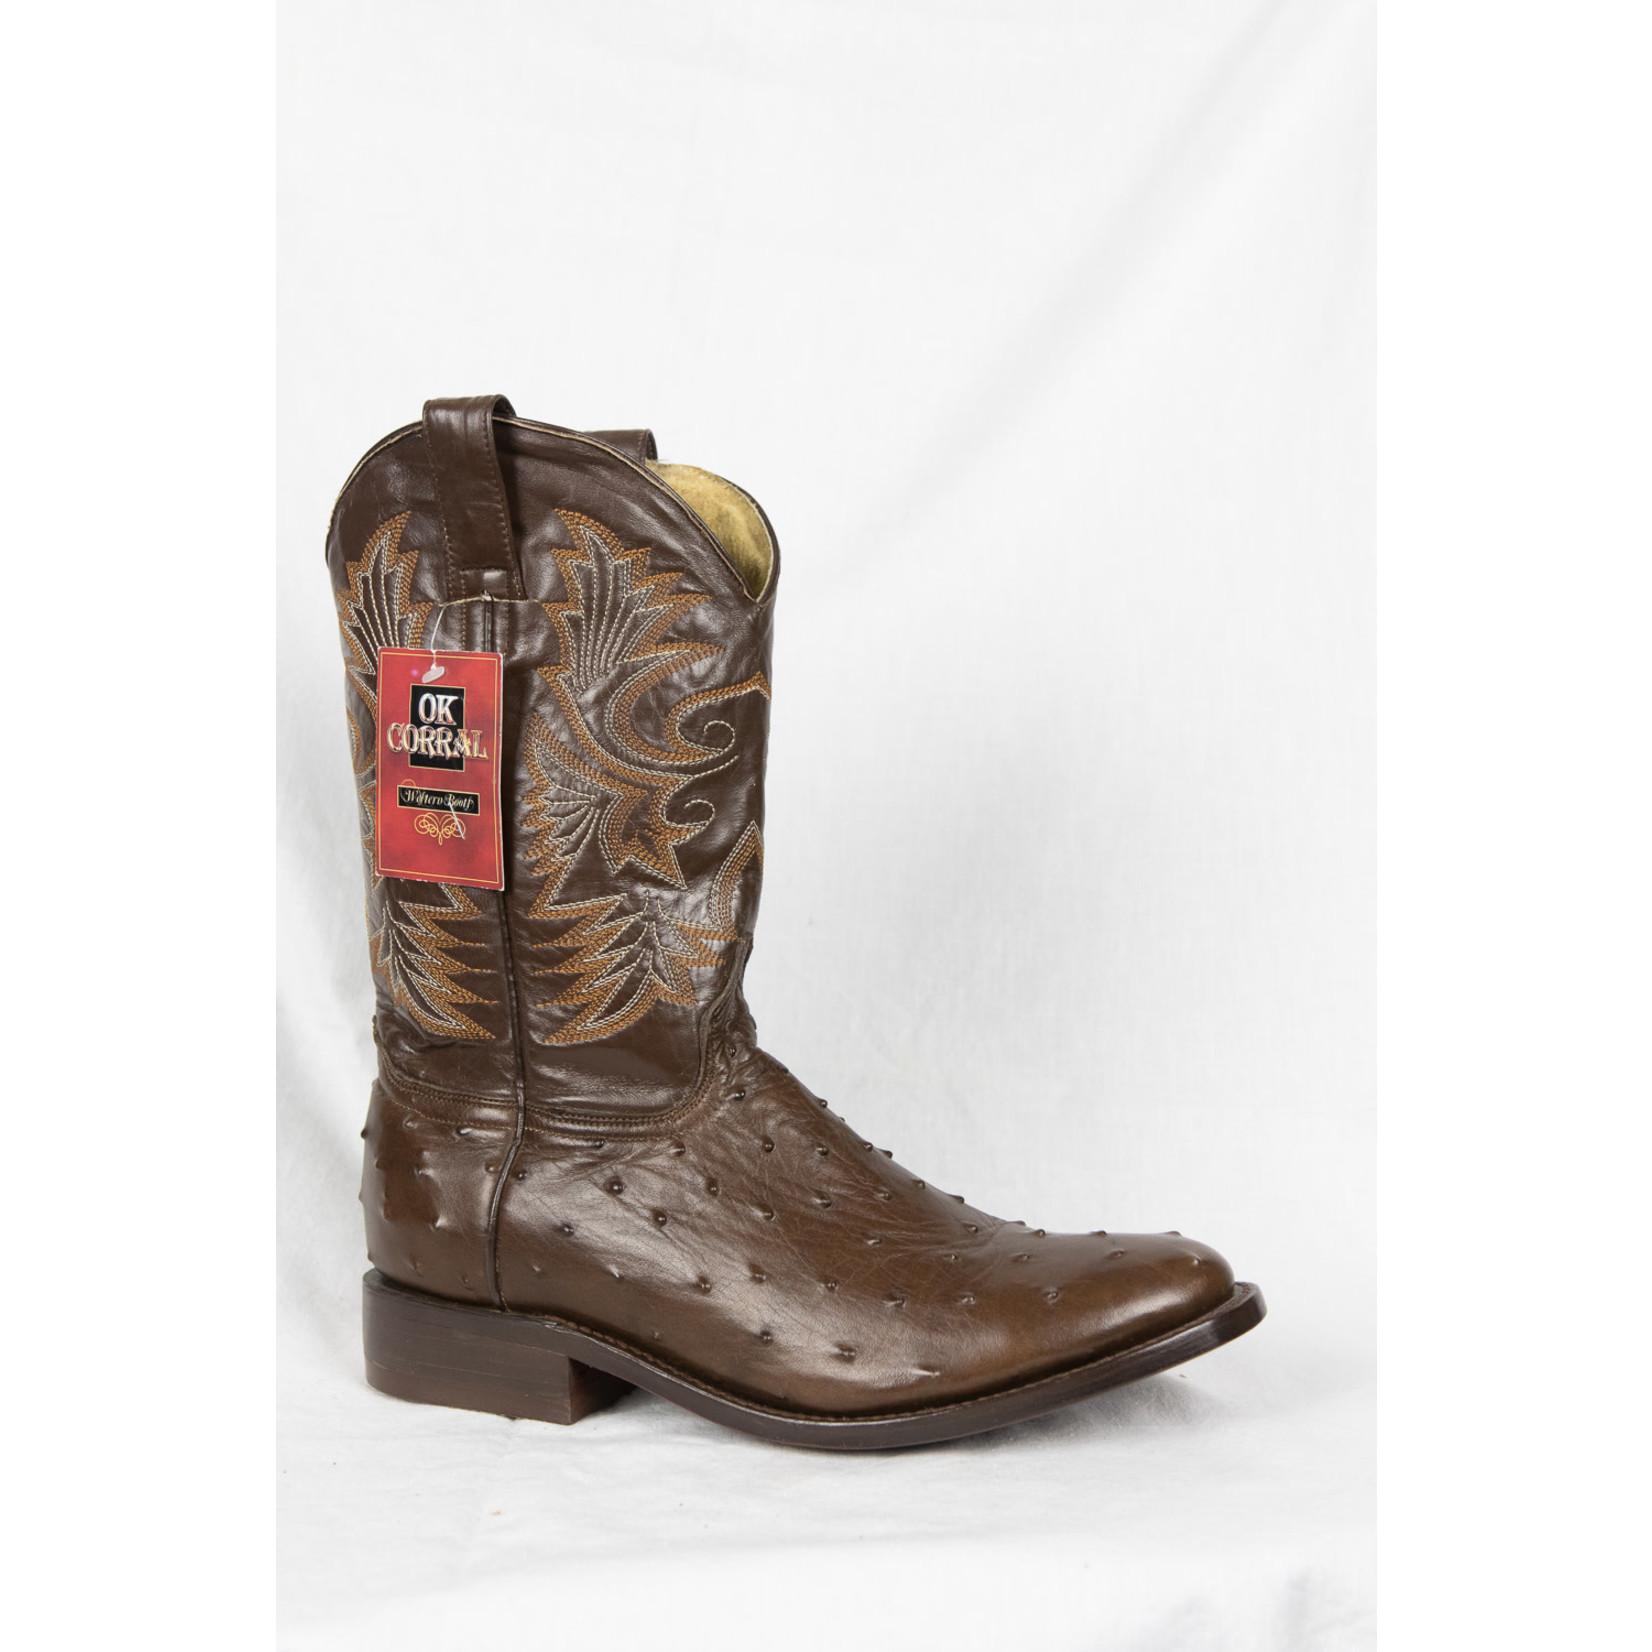 OK Corral Ladies Cowboy Boot